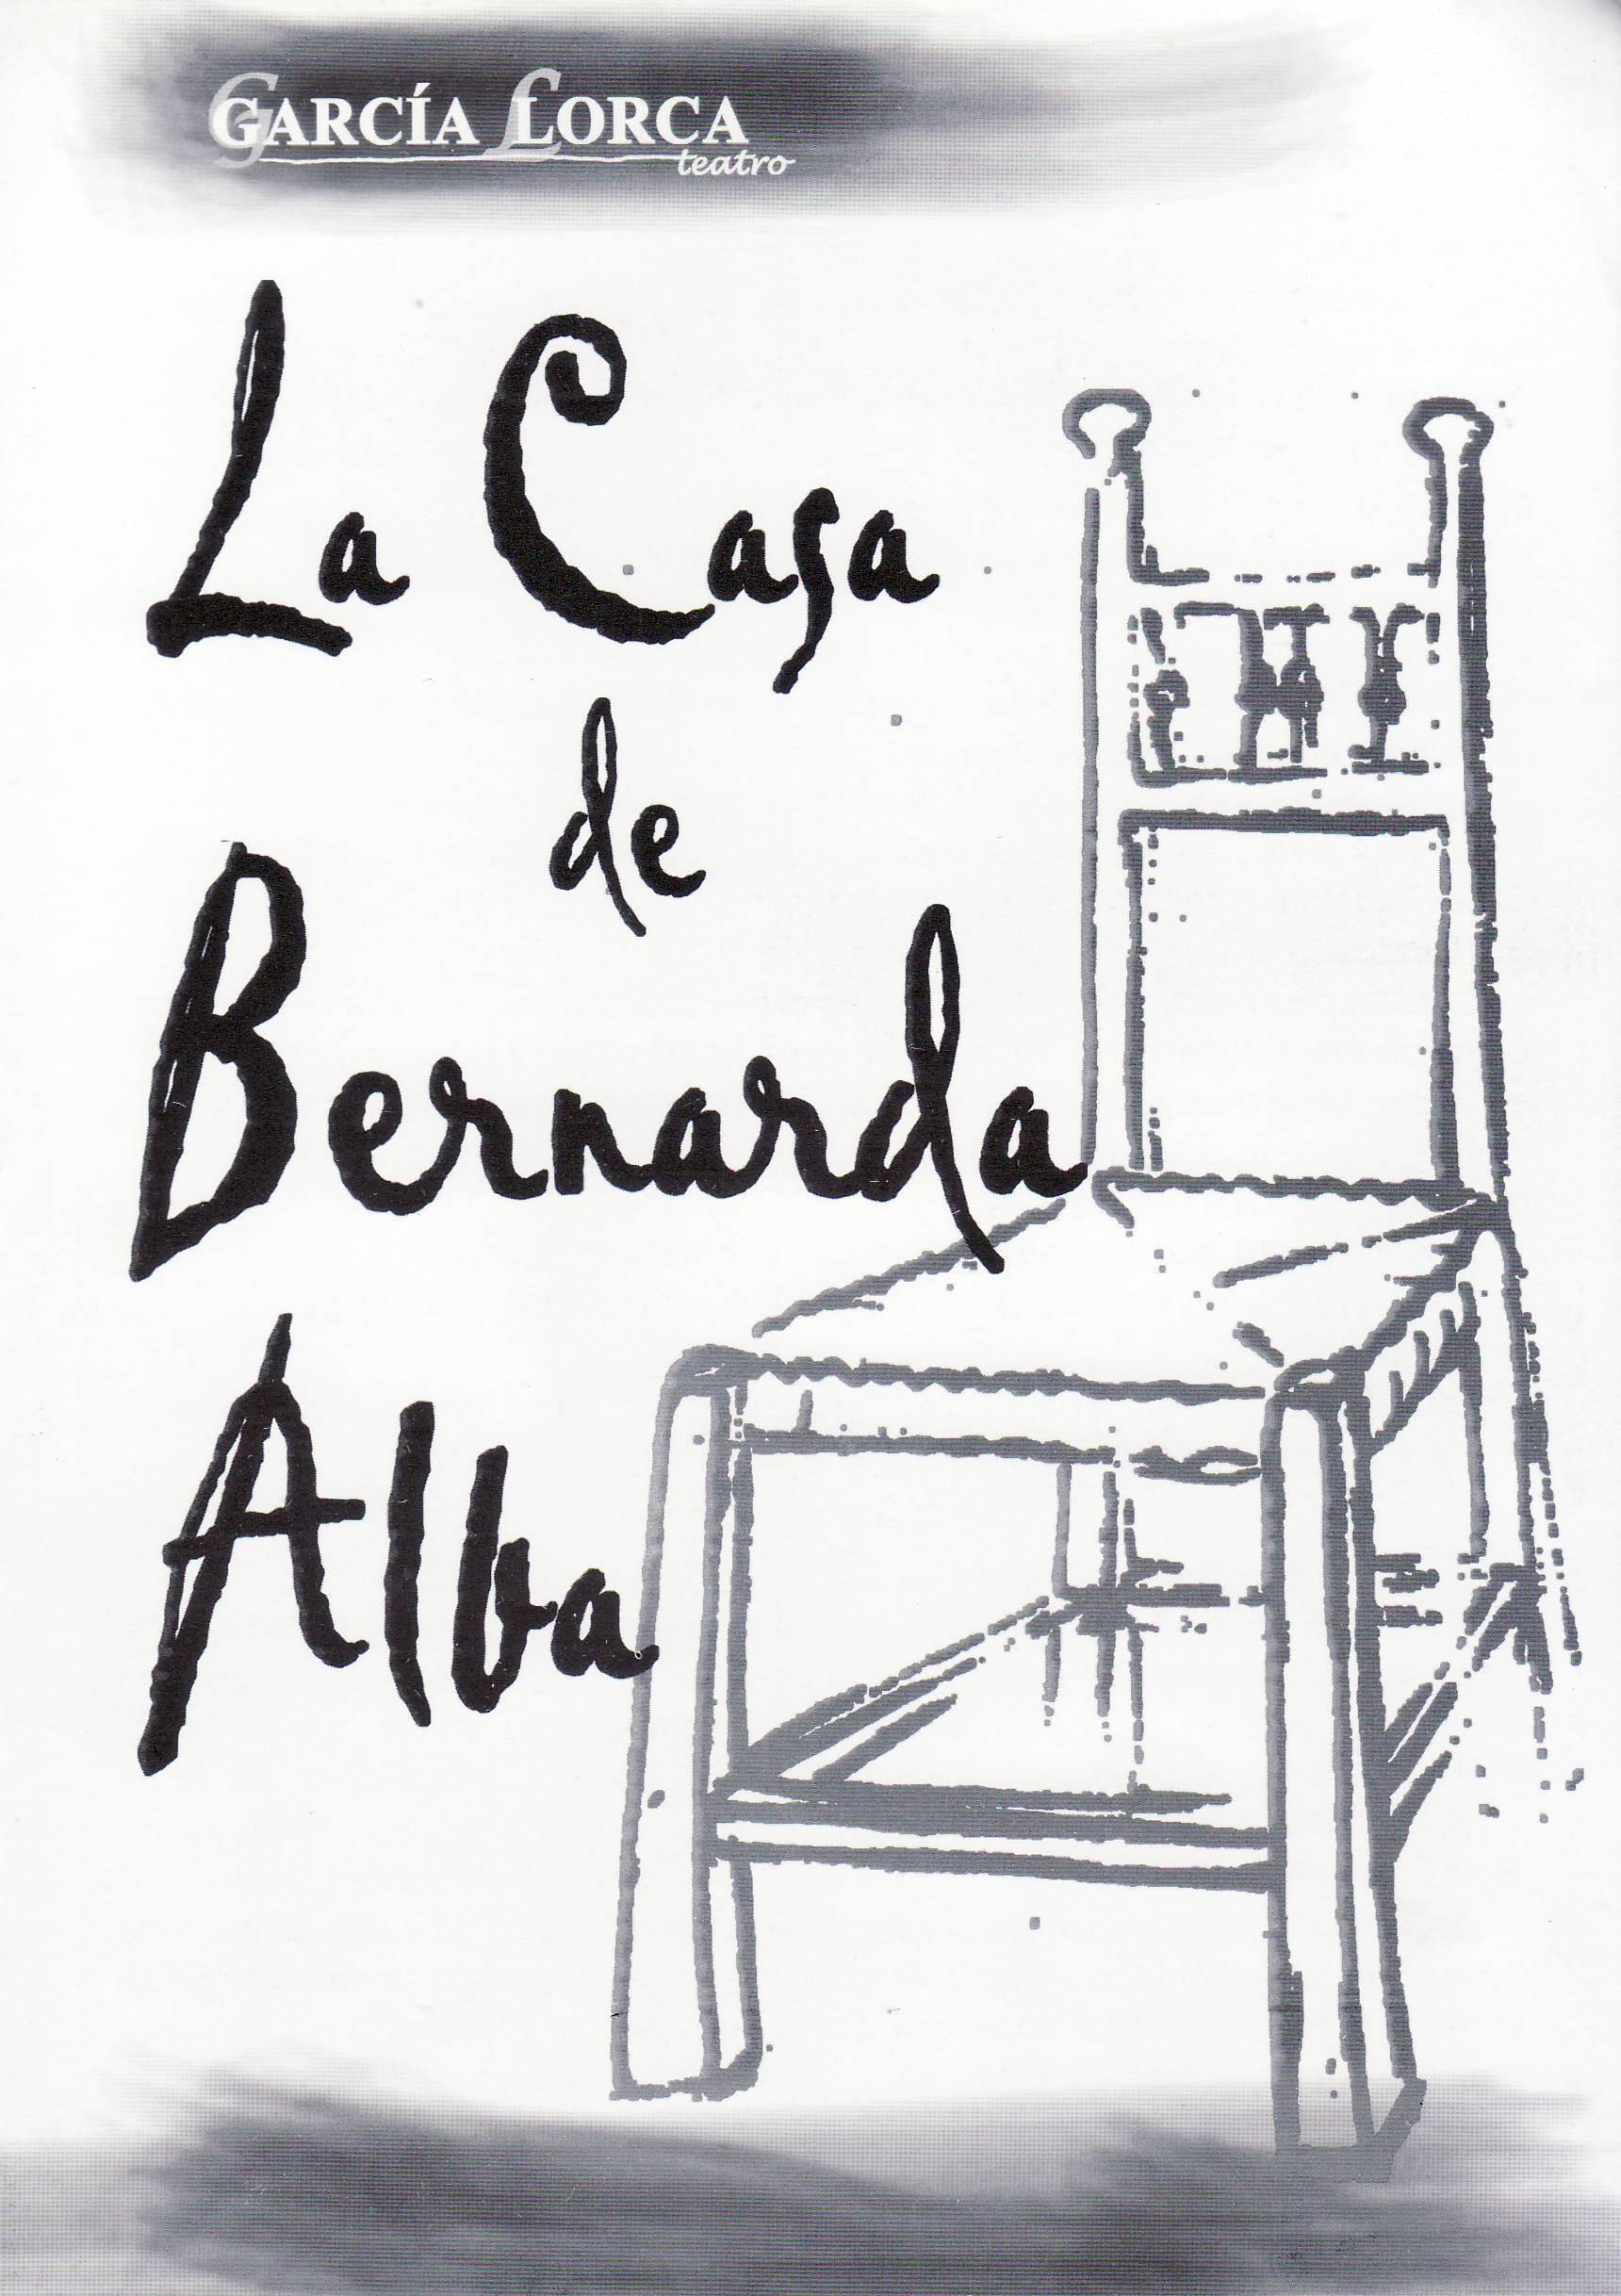 CASA DE BERNARDA BYN